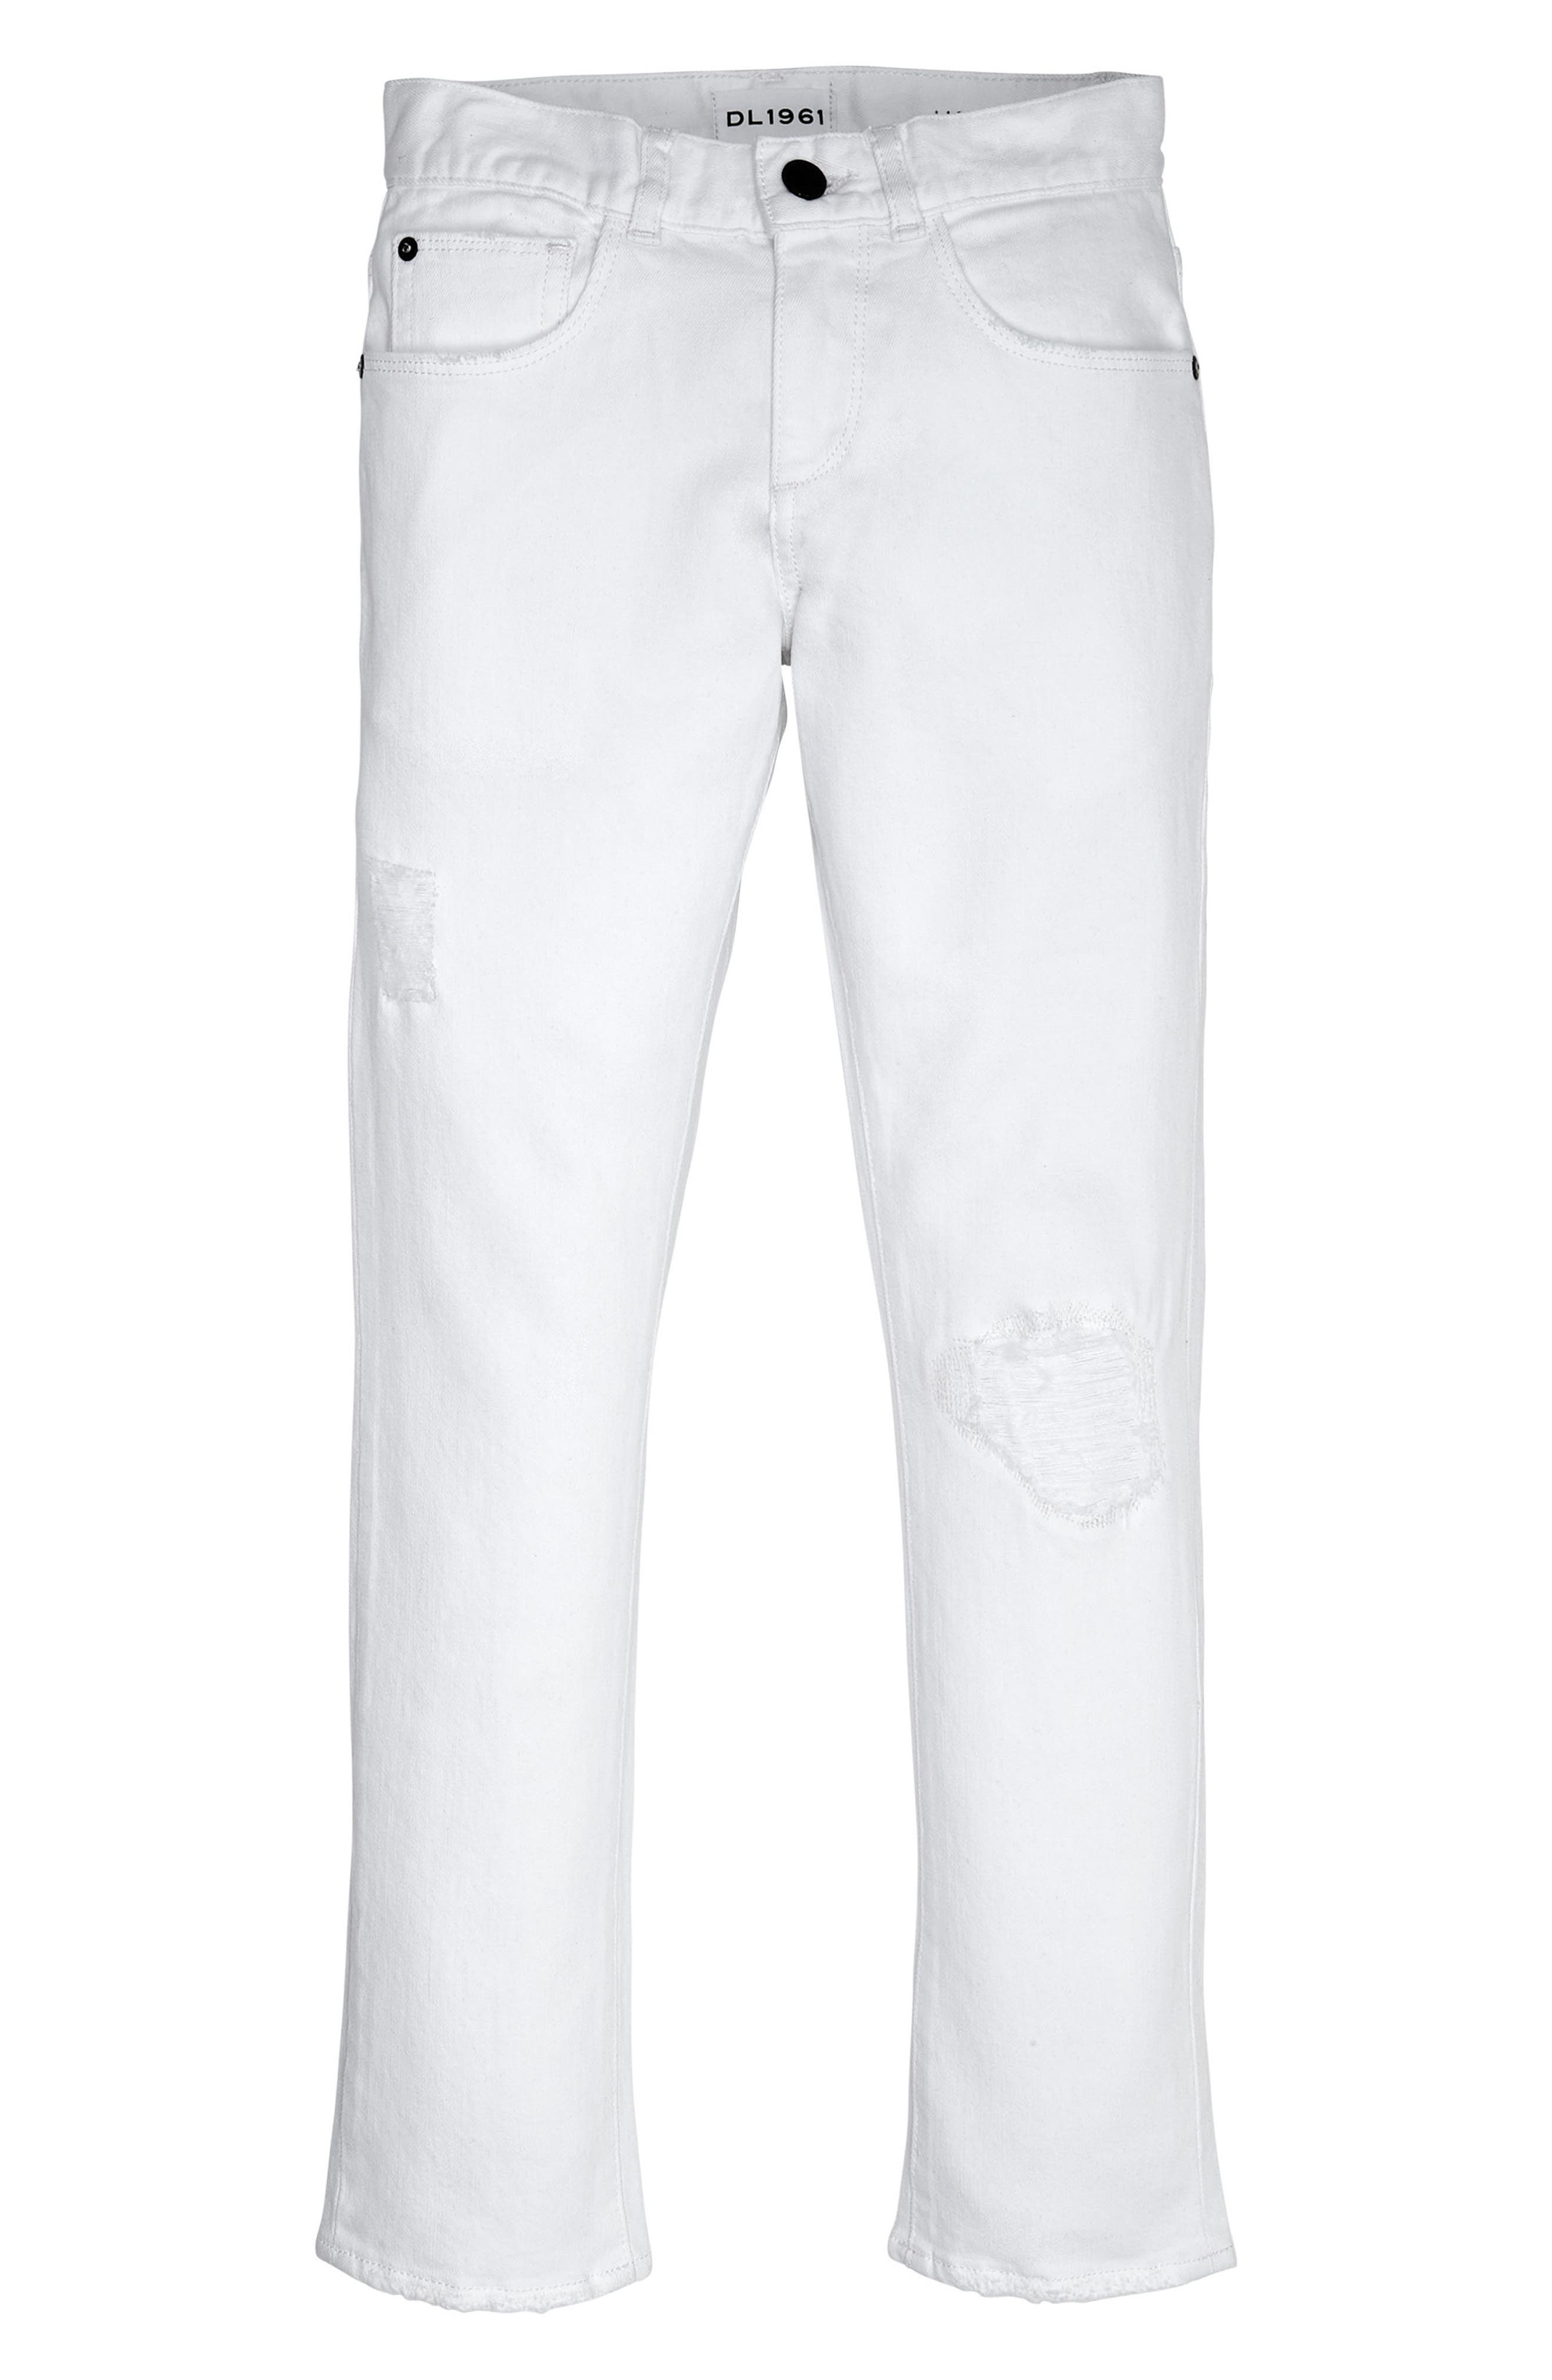 Brady Distressed Slim Fit Jeans,                             Main thumbnail 1, color,                             Bulletproof